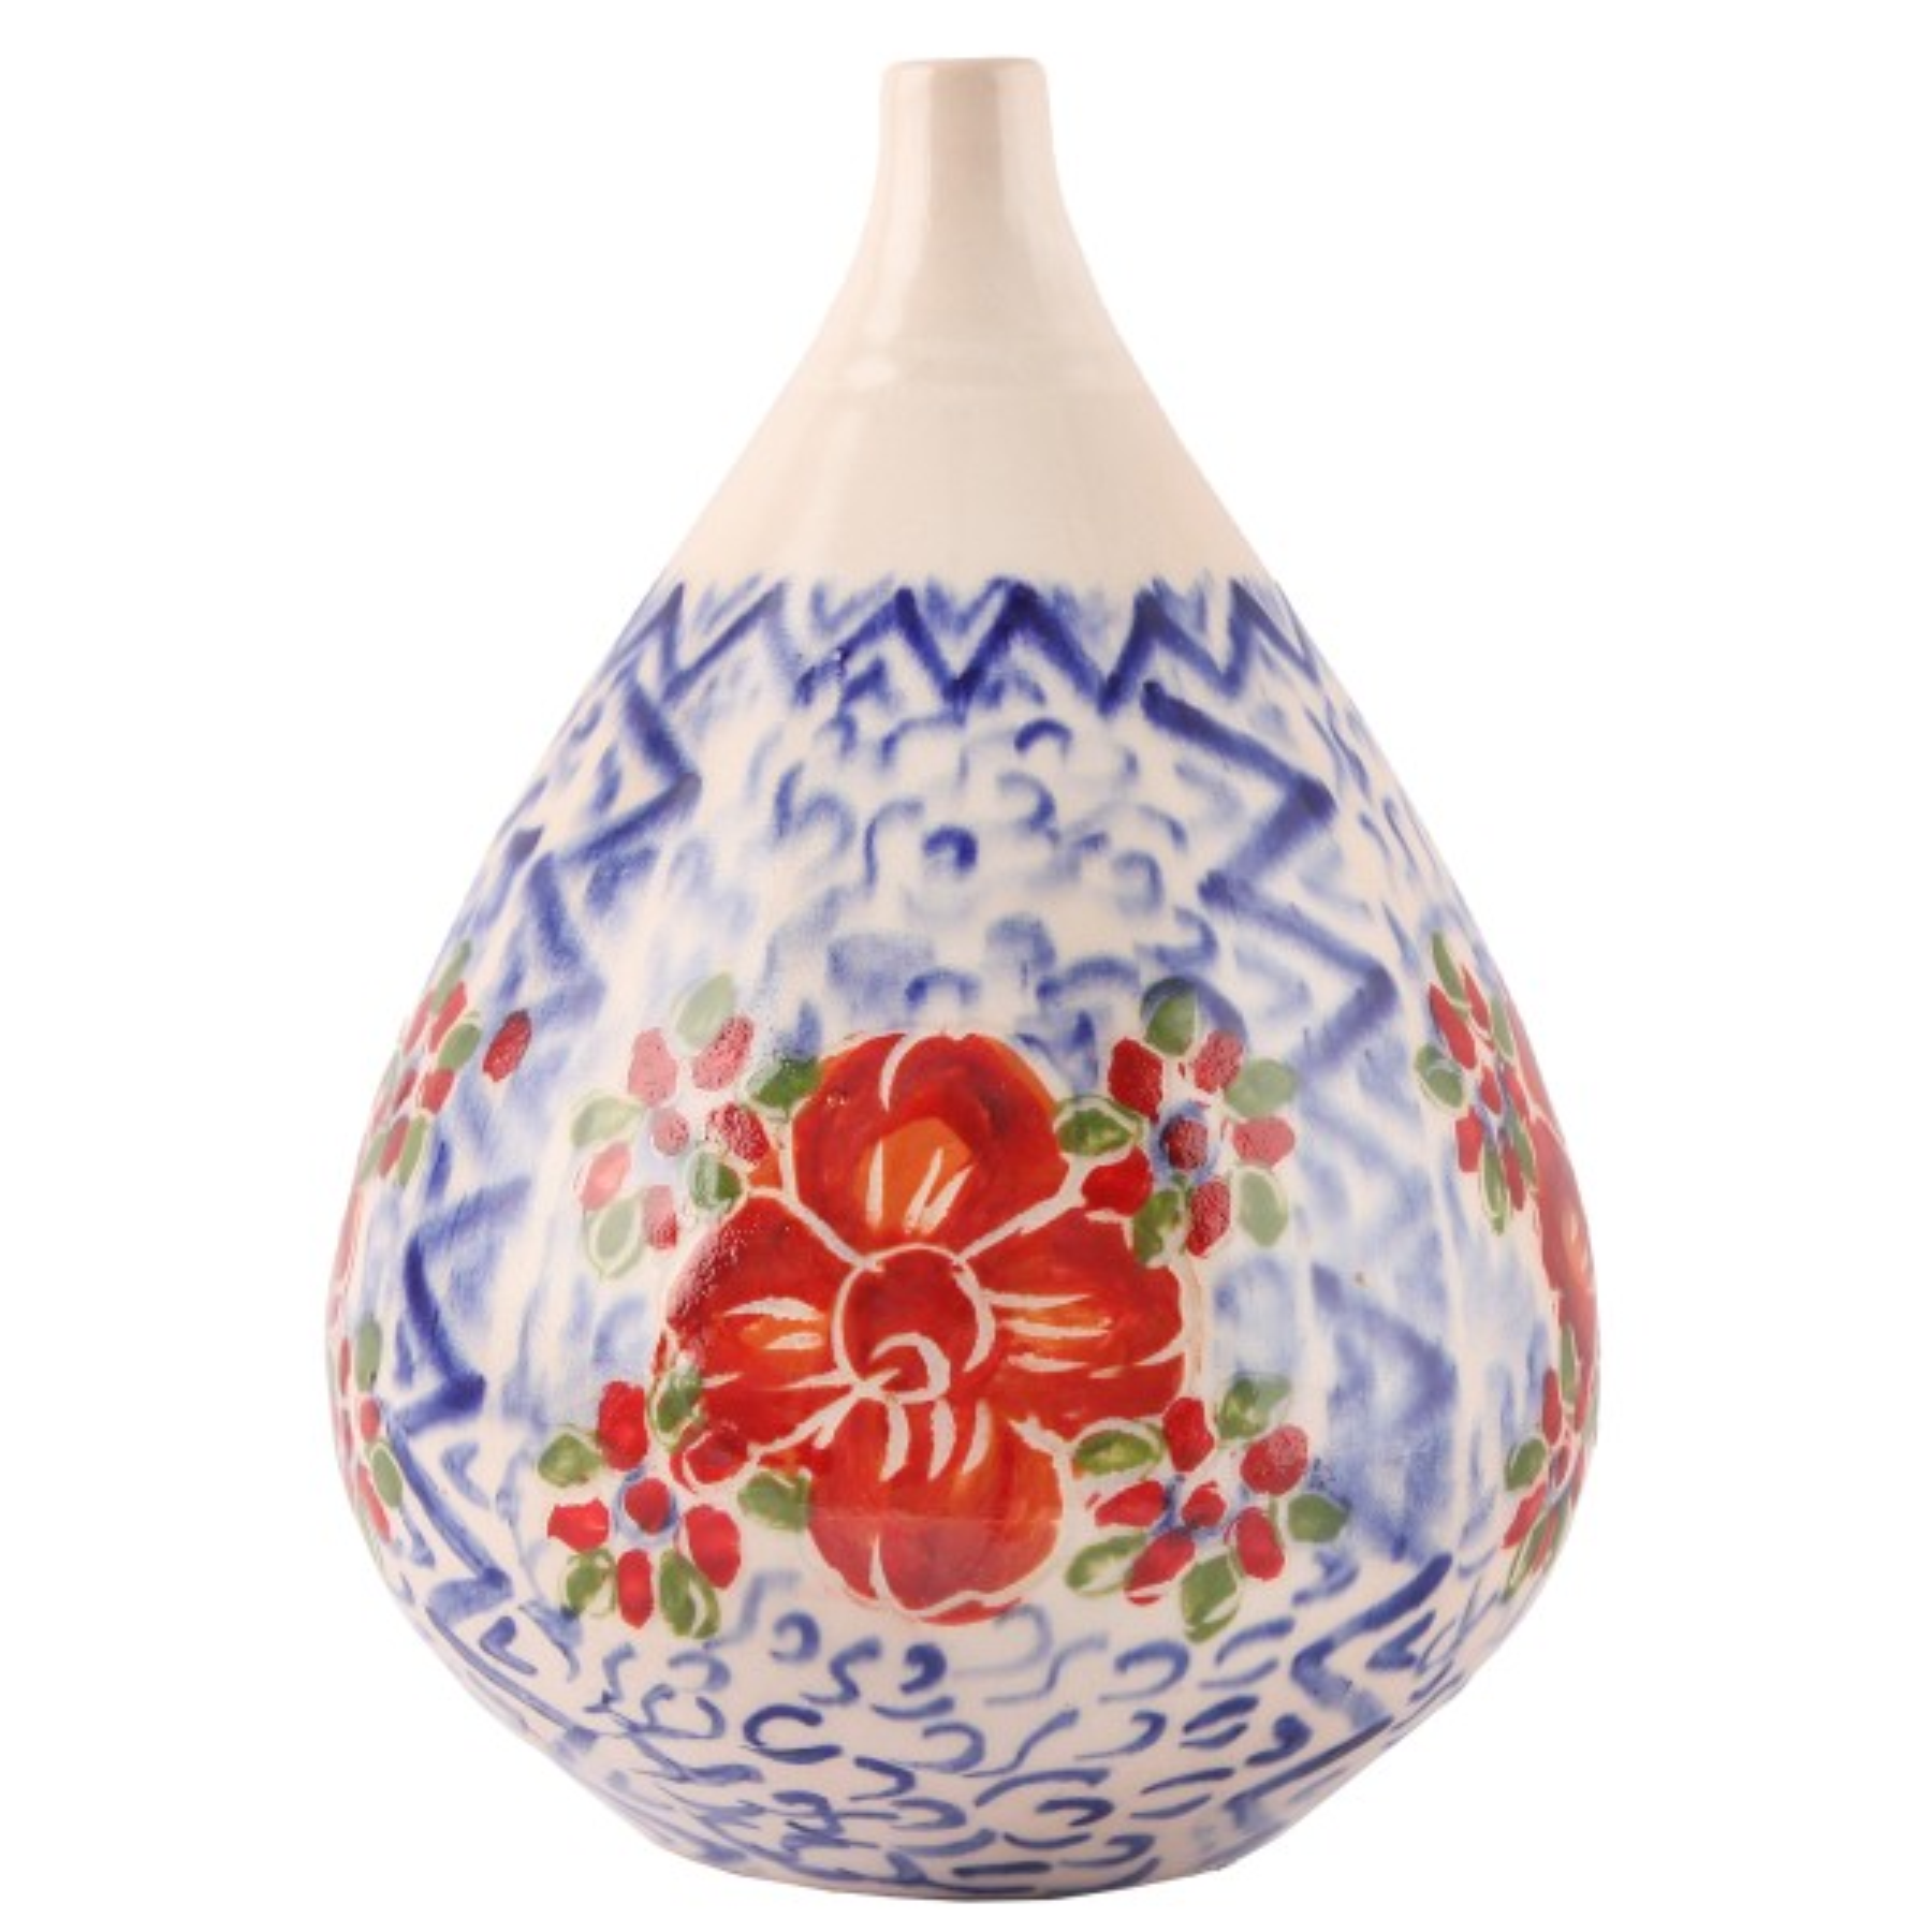 گلدان سرامیکی گالری فرتاش طرح توتک کد 171124